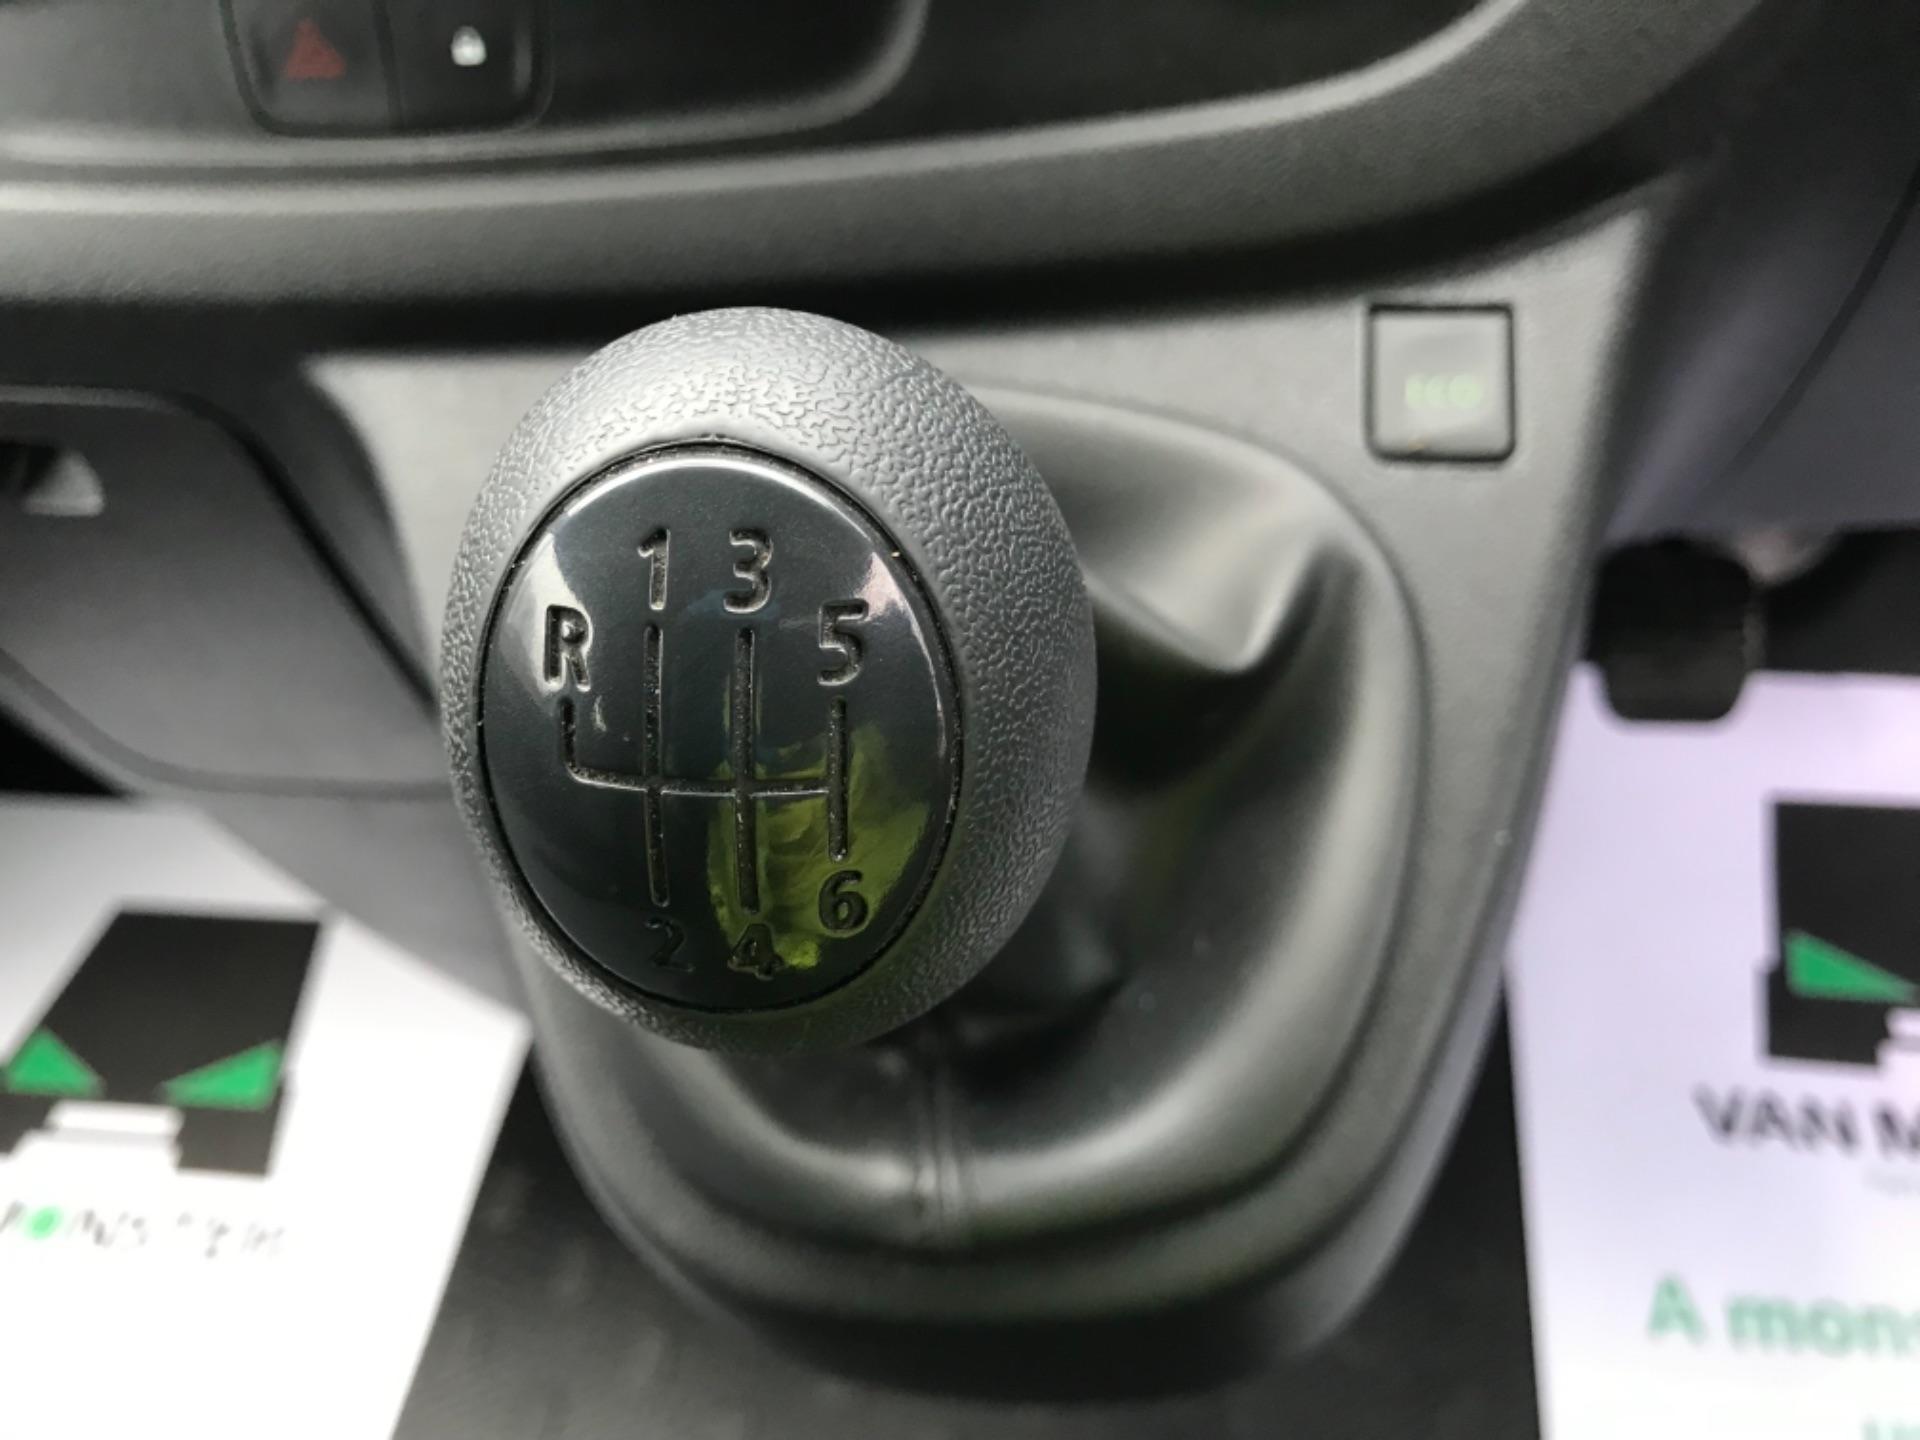 2017 Vauxhall Vivaro 2900 1.6Cdti Biturbo 125Ps H1 Combi 9 Seat Euro 6 (DY17UGF) Image 16